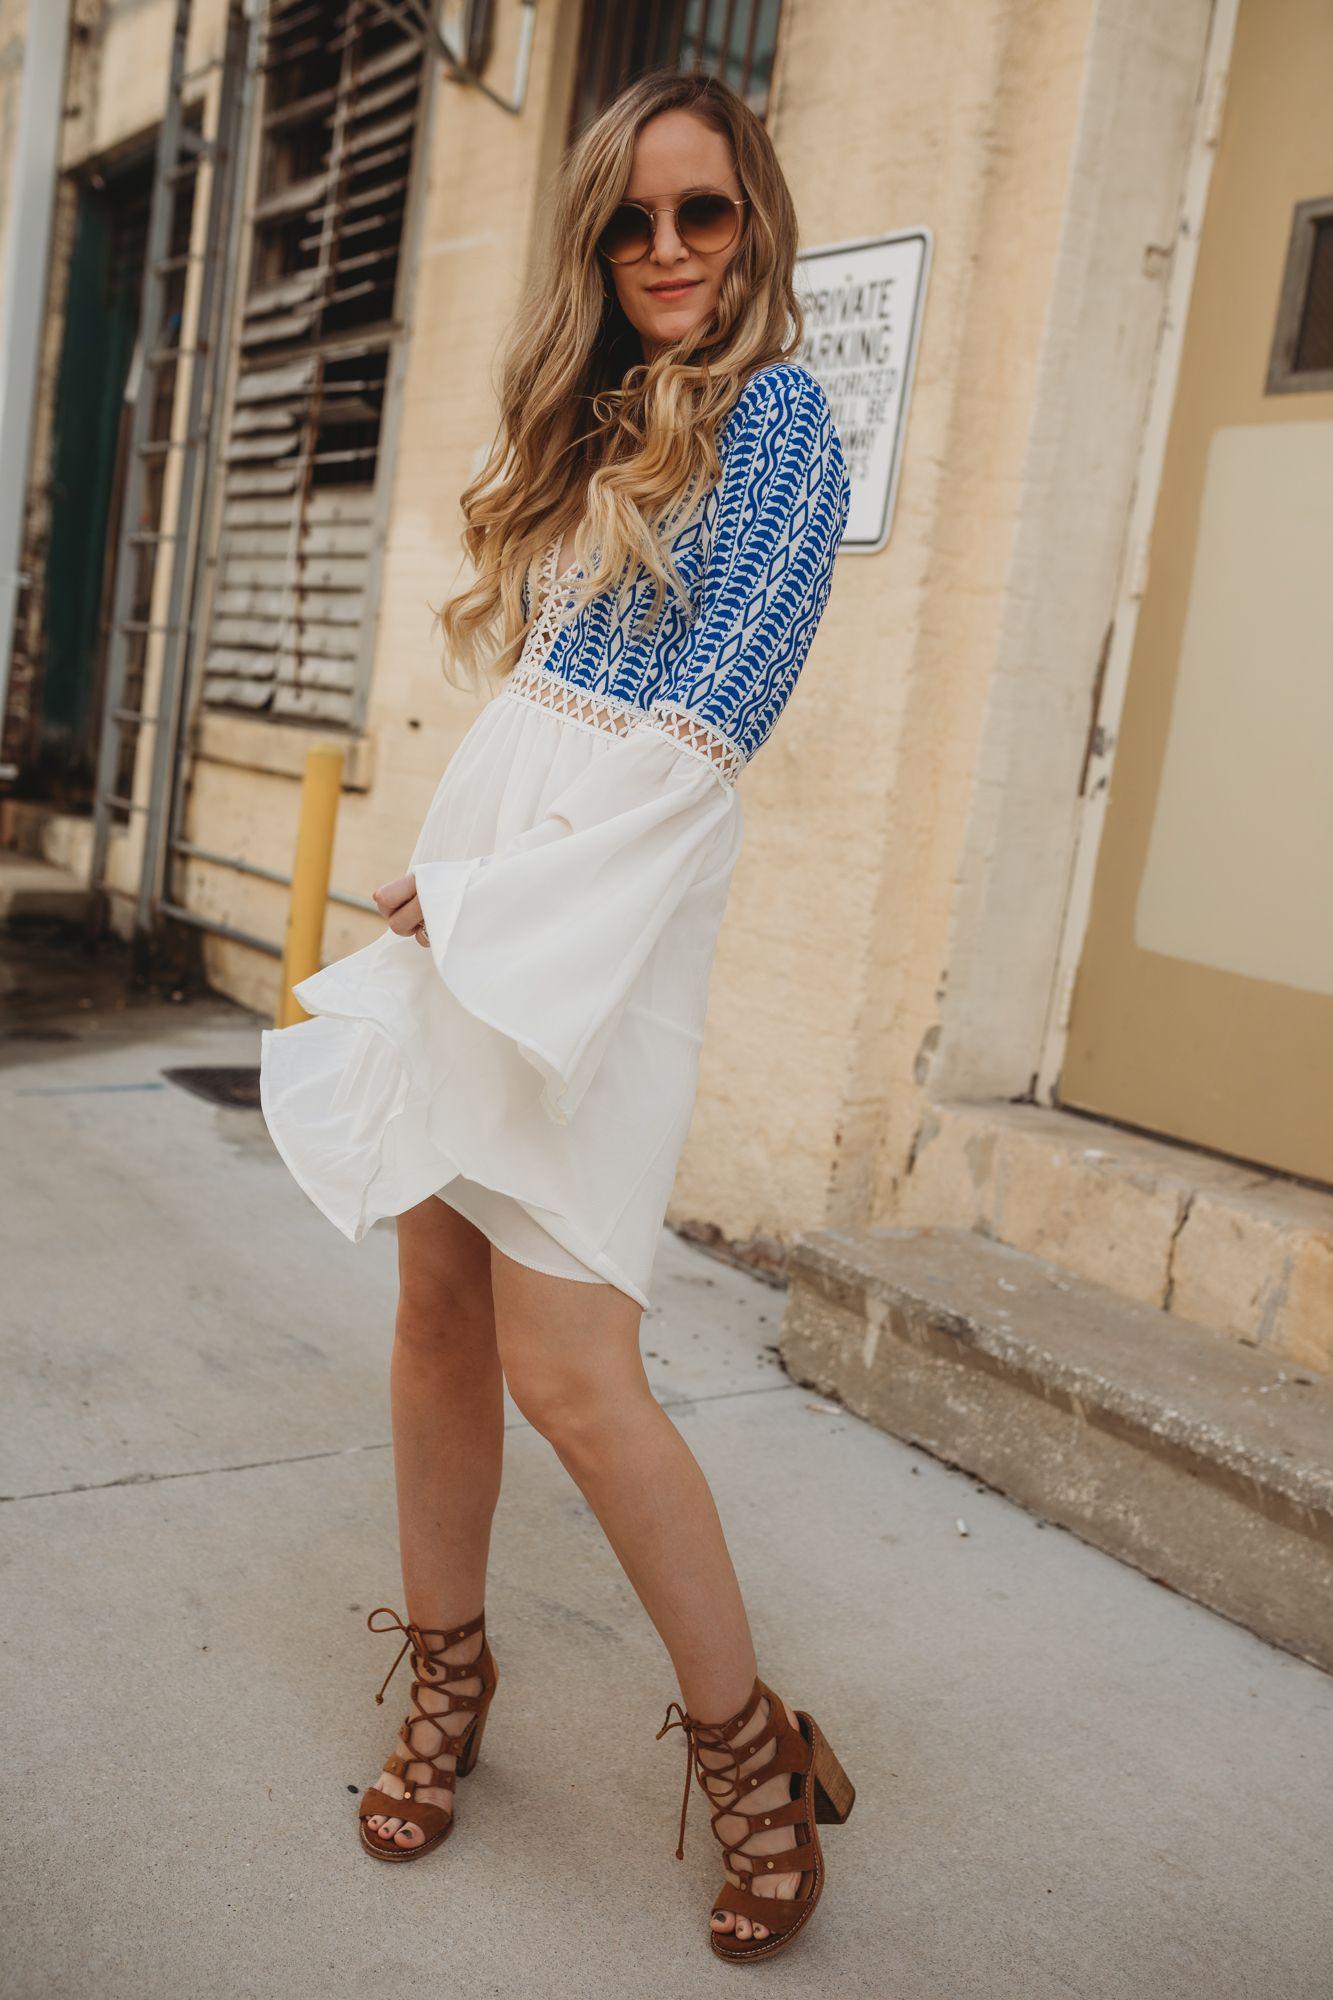 Boho summer outfit upbeat soles orlando florida